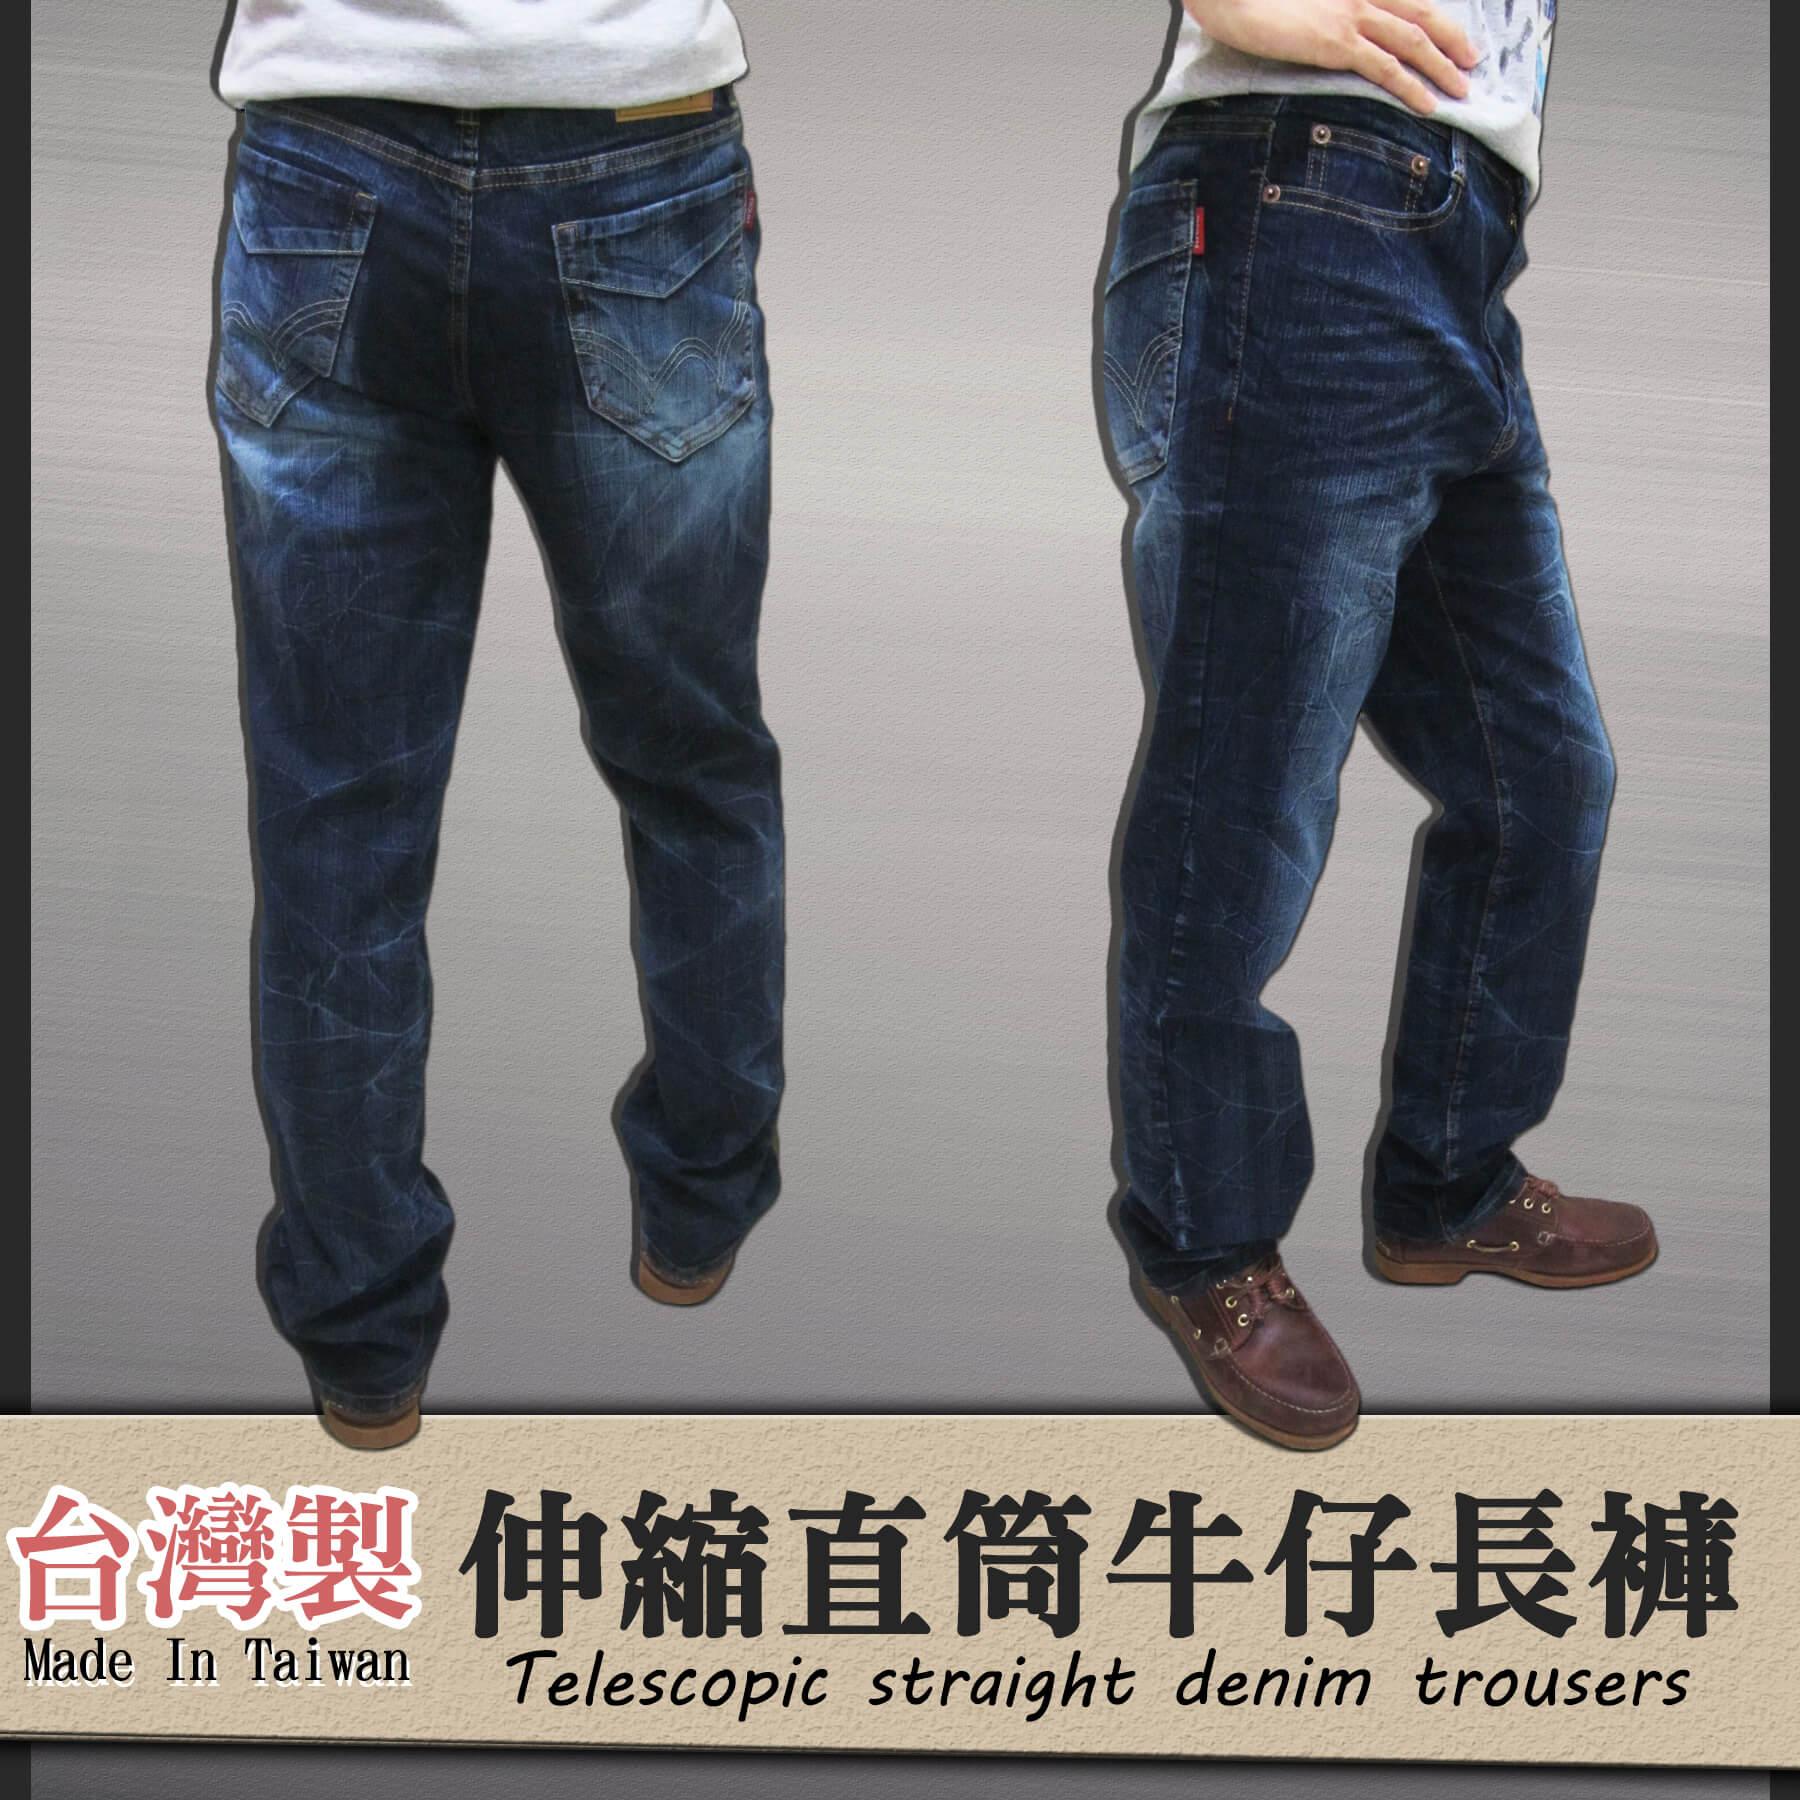 sun-e台灣製造牛仔長褲、伸縮直筒牛仔褲、台灣製單寧長褲(345-5876-31)深牛 腰圍:M L XL 2L 3L 4L (28~39)英吋 0